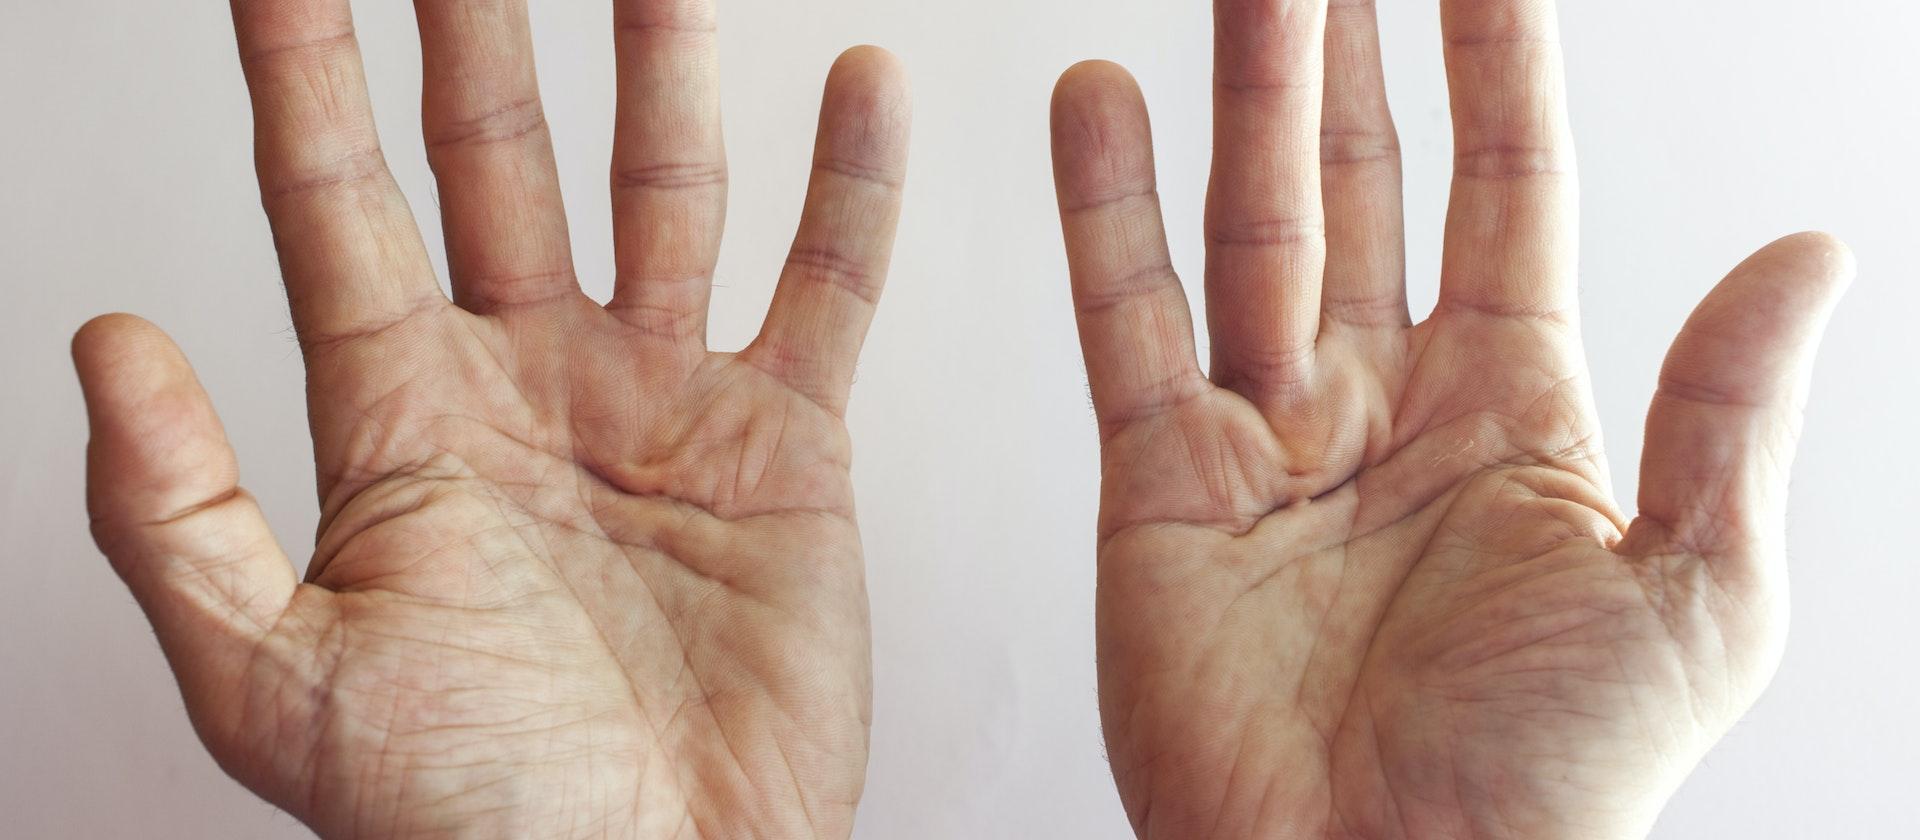 swollen thumb symptoms causes treatment options buoy